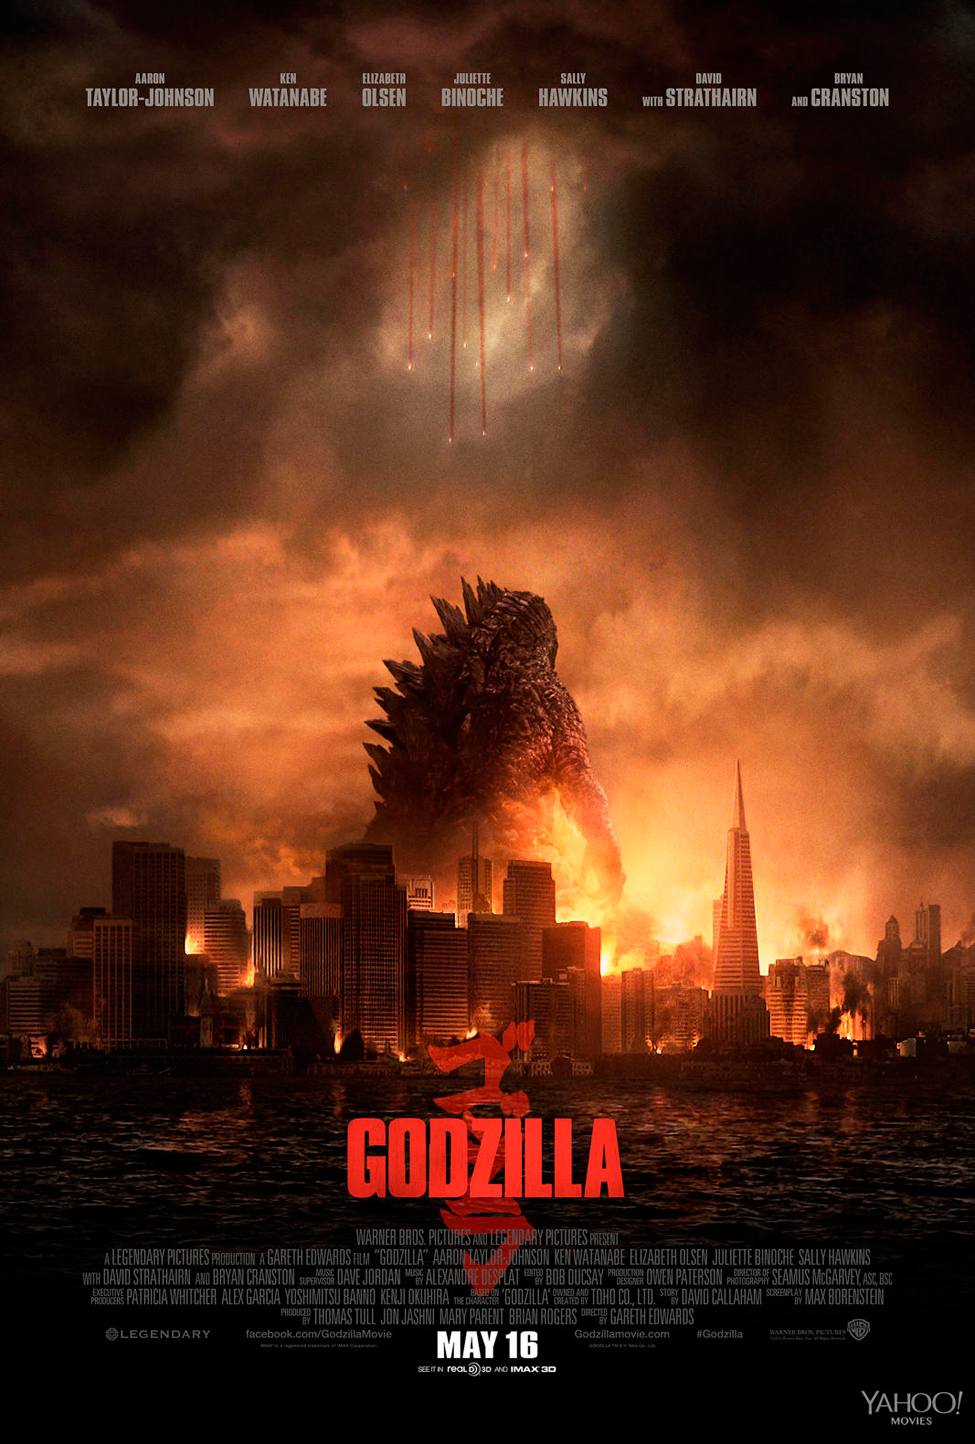 Godzilla cartel